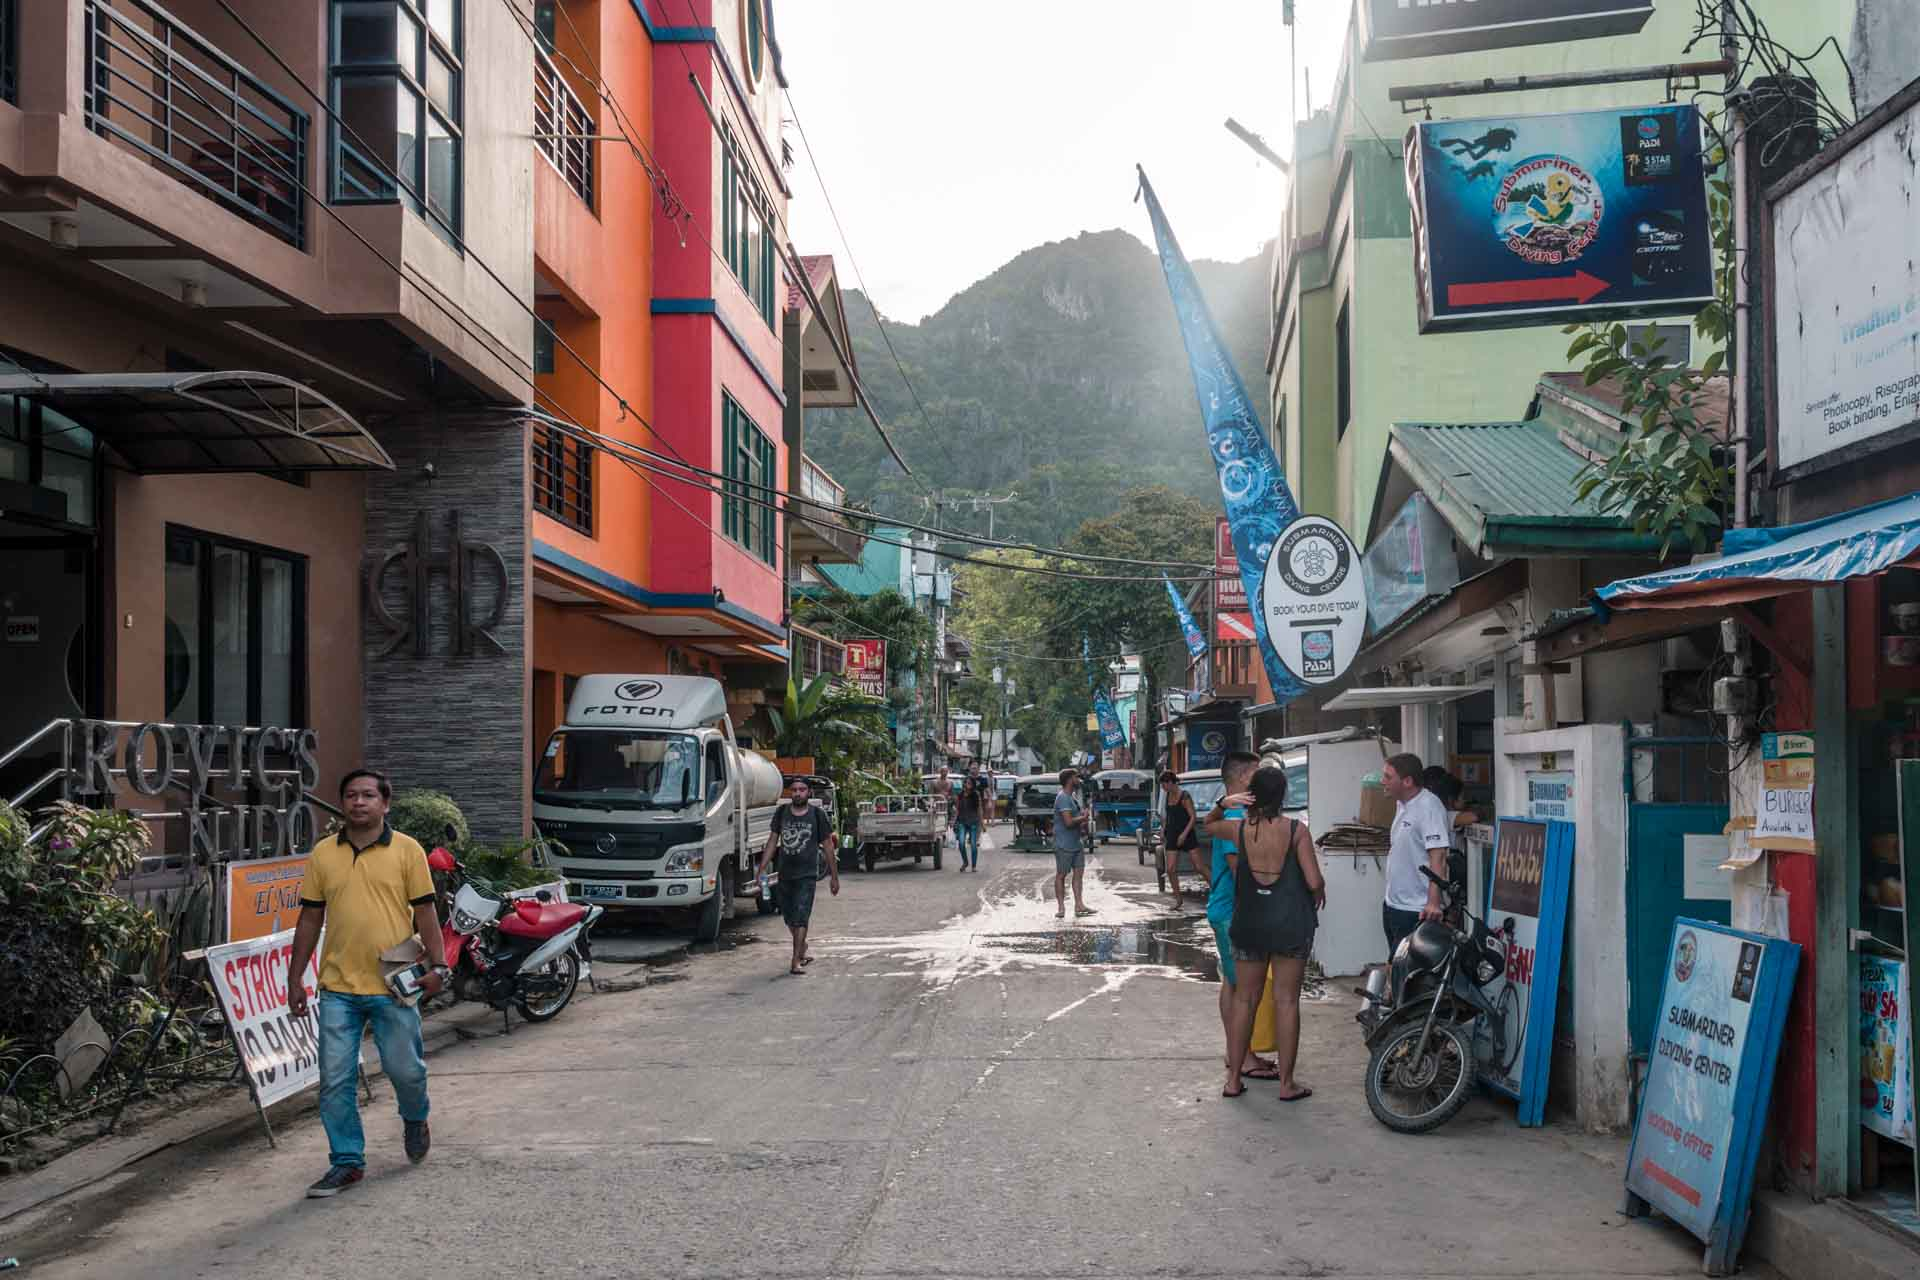 Small street in El Nido Town